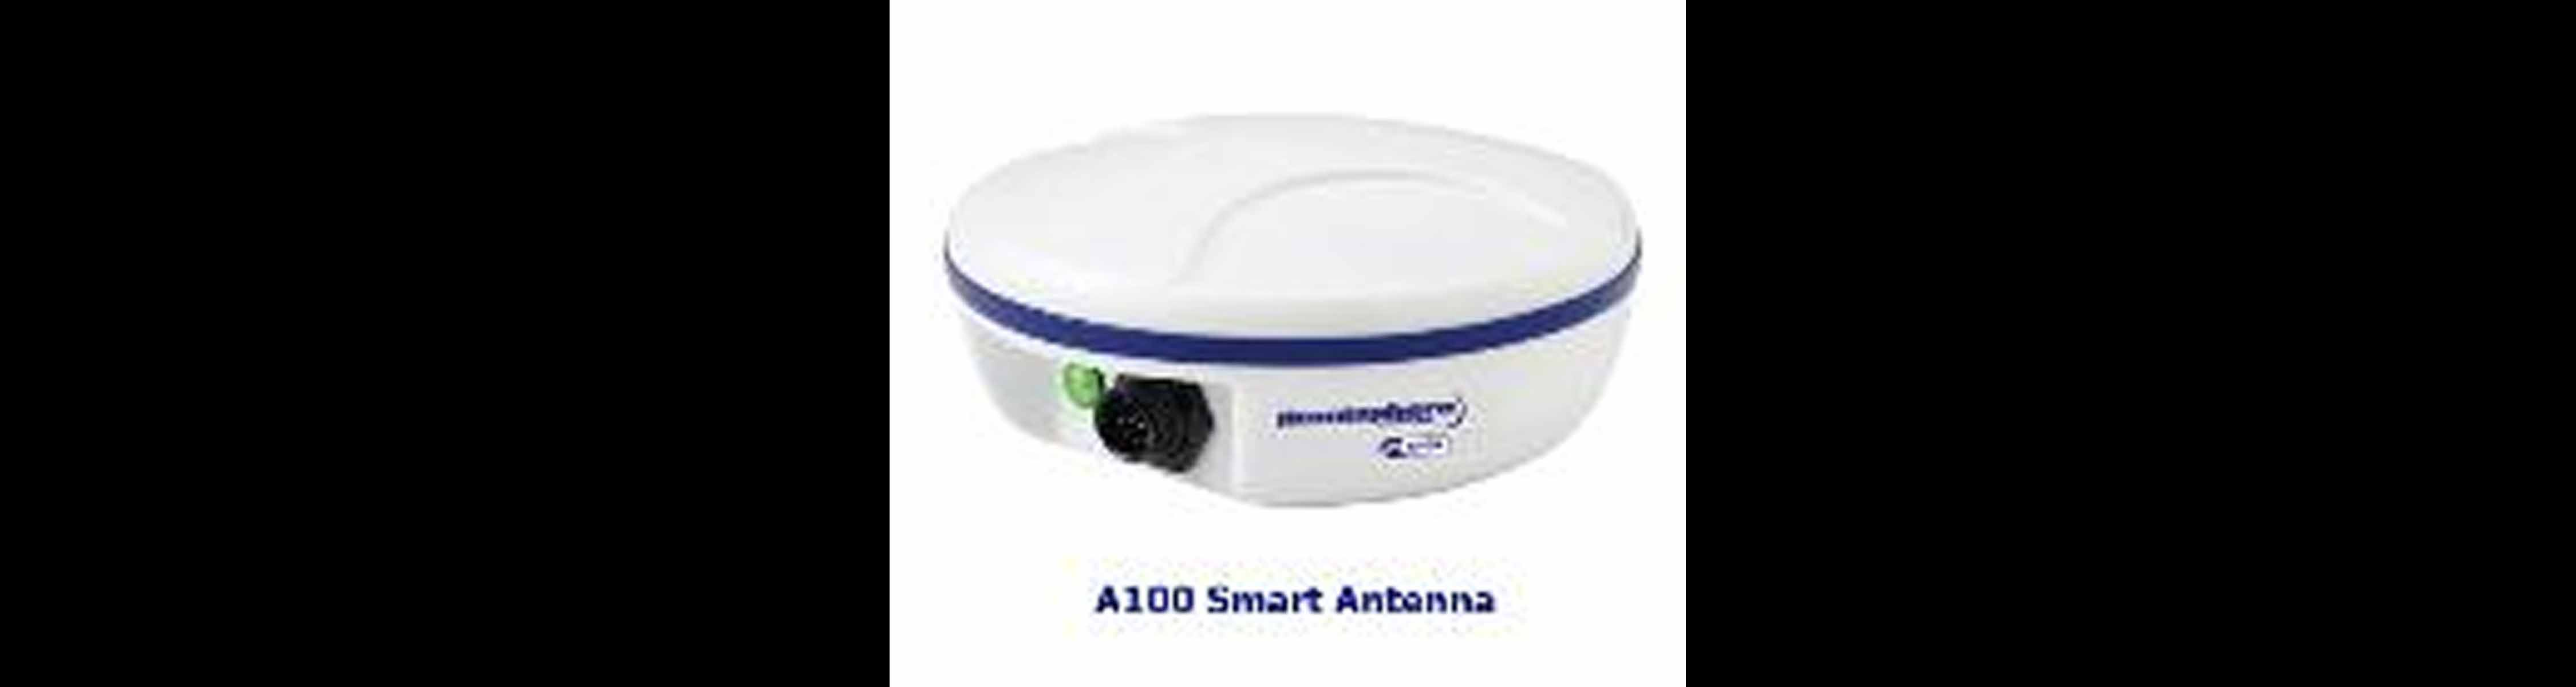 Hemisphere GPS A100 Smart Antenna